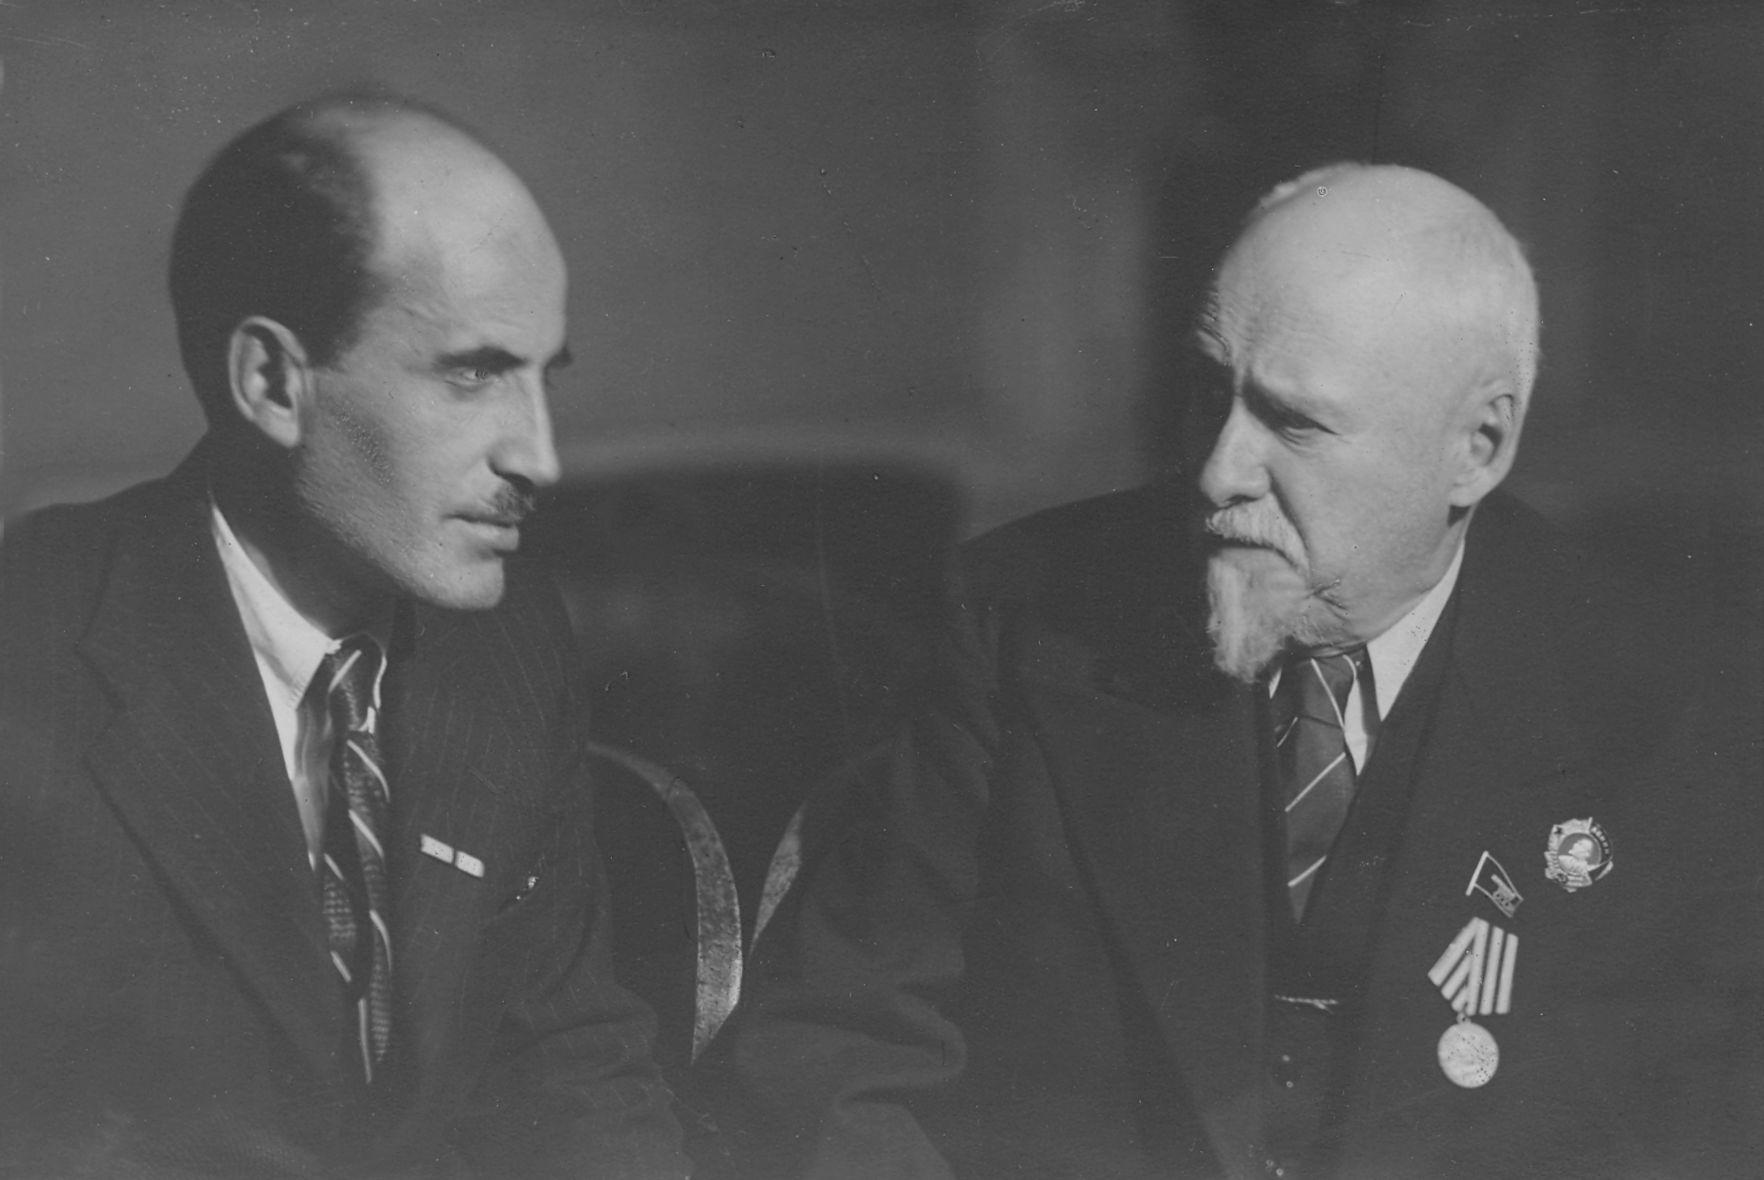 Х. С. Коштоянц и В. Л. Комаров, 1945 г.